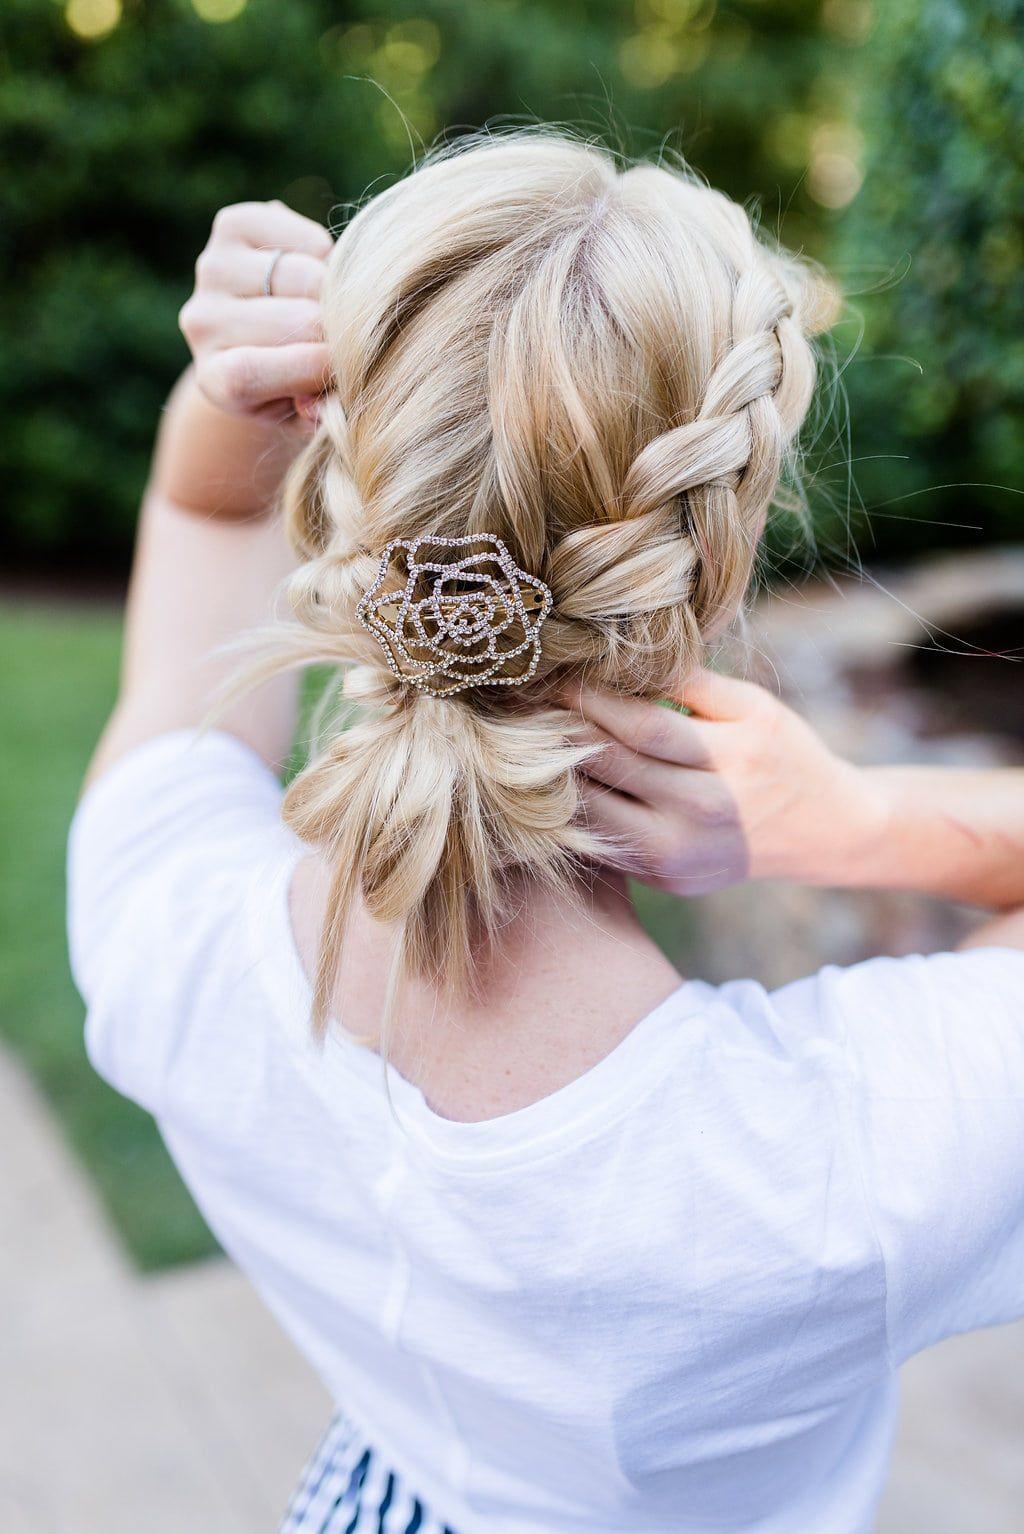 easy braid updo | Braided hairstyles updo, Braided updo ...